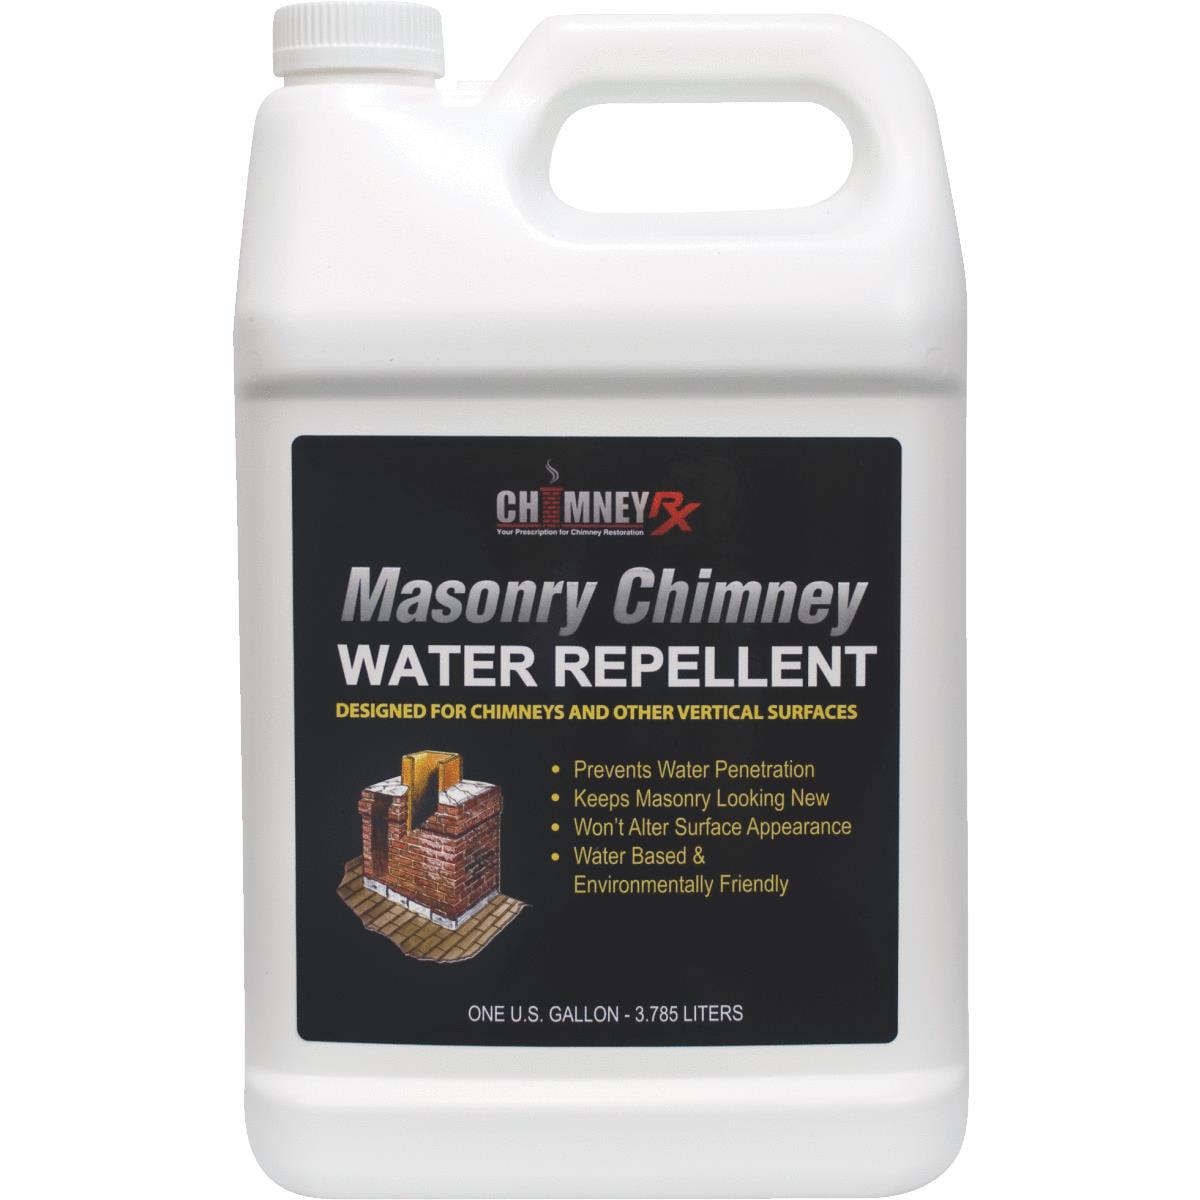 Chimney RX Chimney Masonry Waterproofer by SAVER SYSTEMS INC